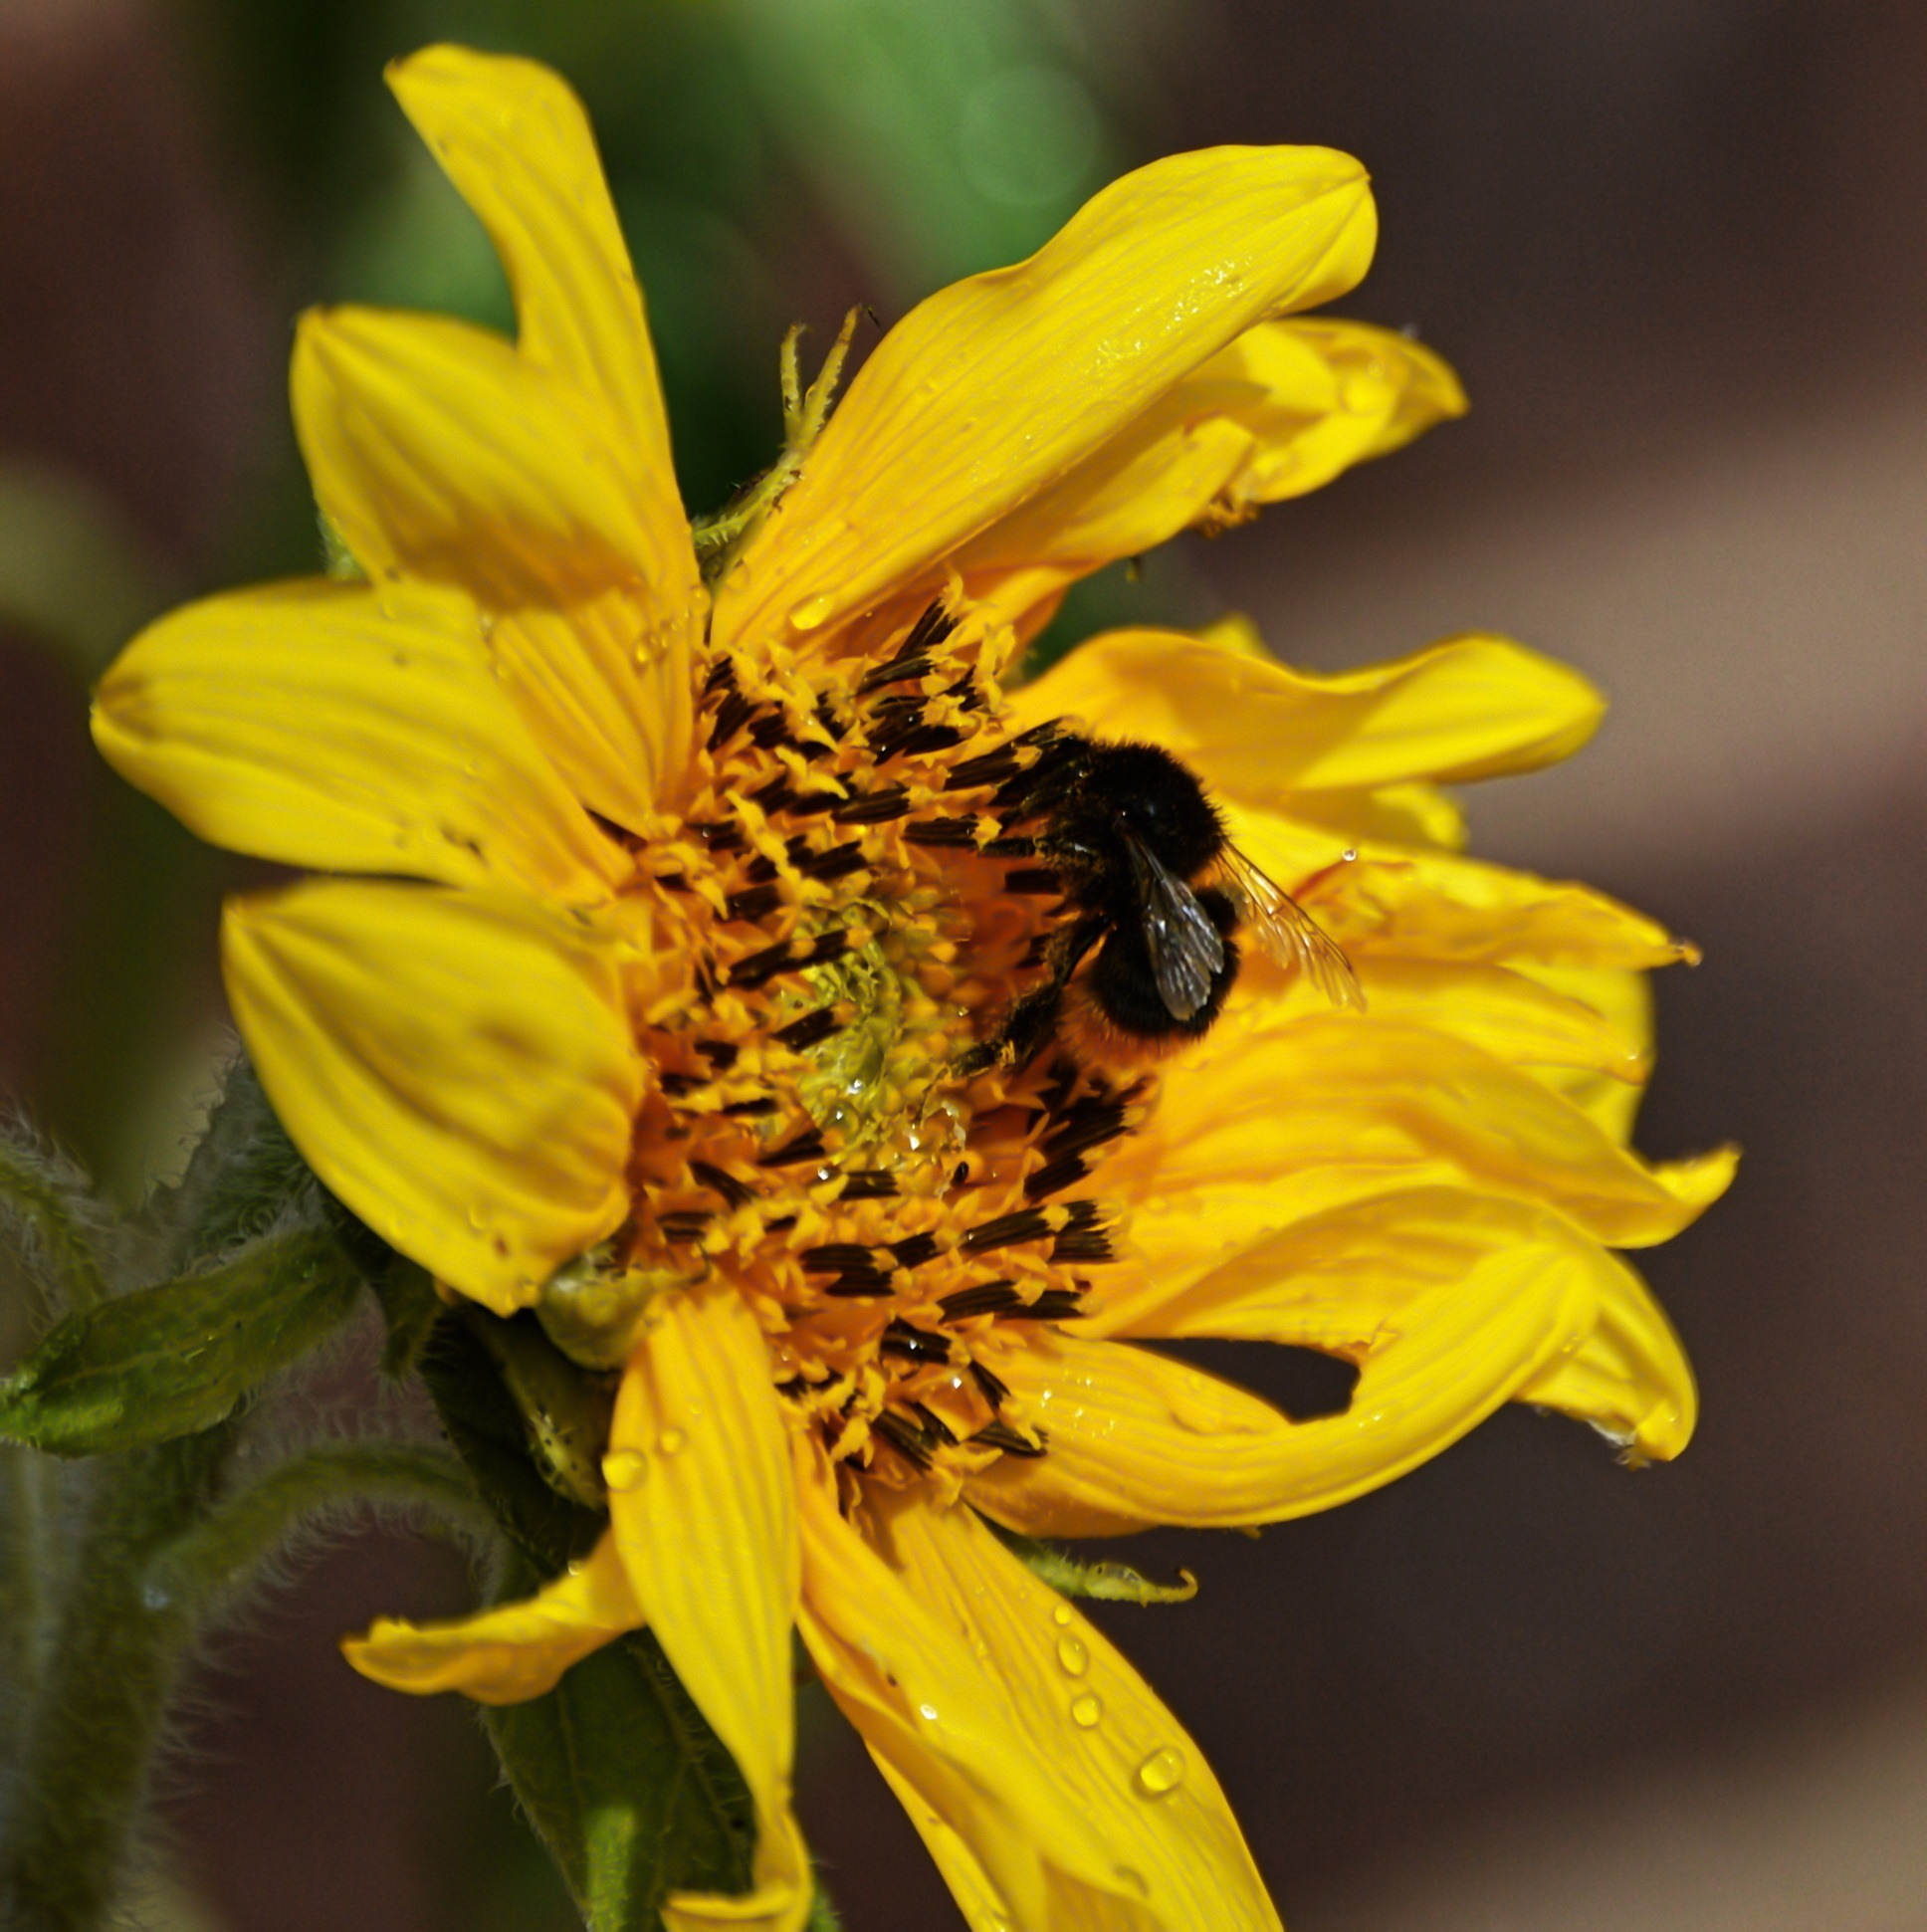 Bee a sunflower by Gordon